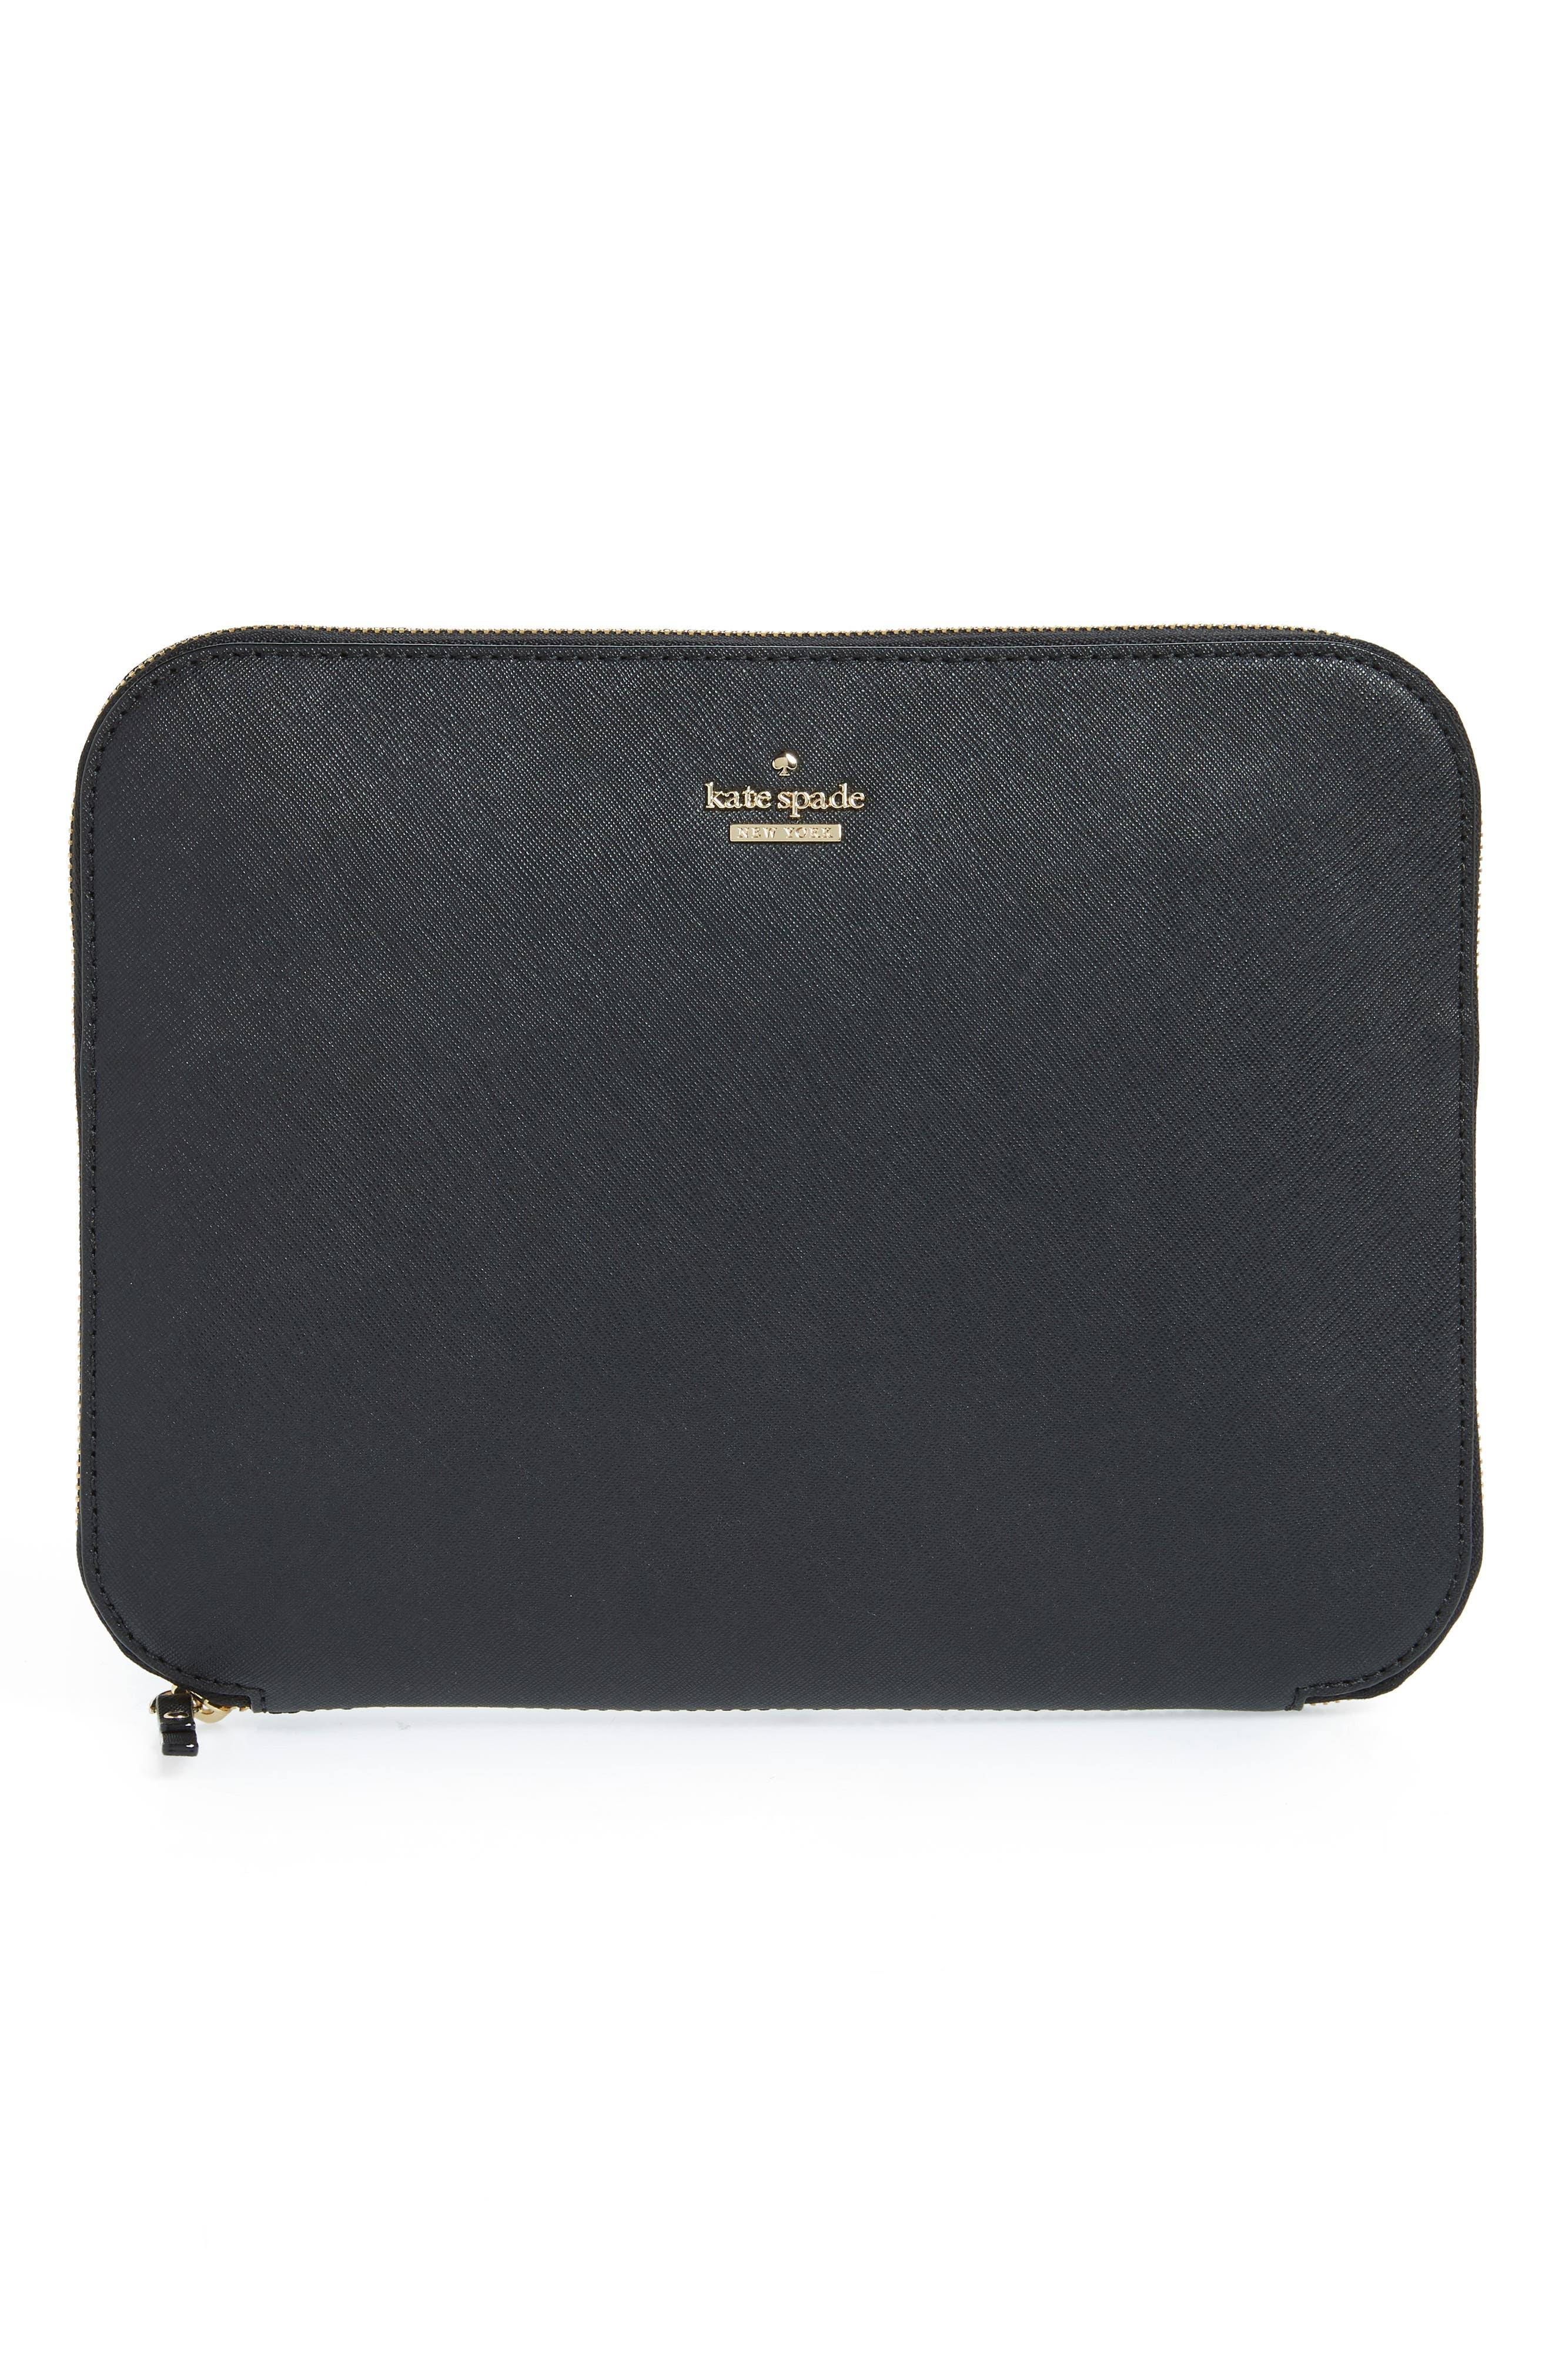 saffiano leather organization tablet sleeve,                         Main,                         color, Black